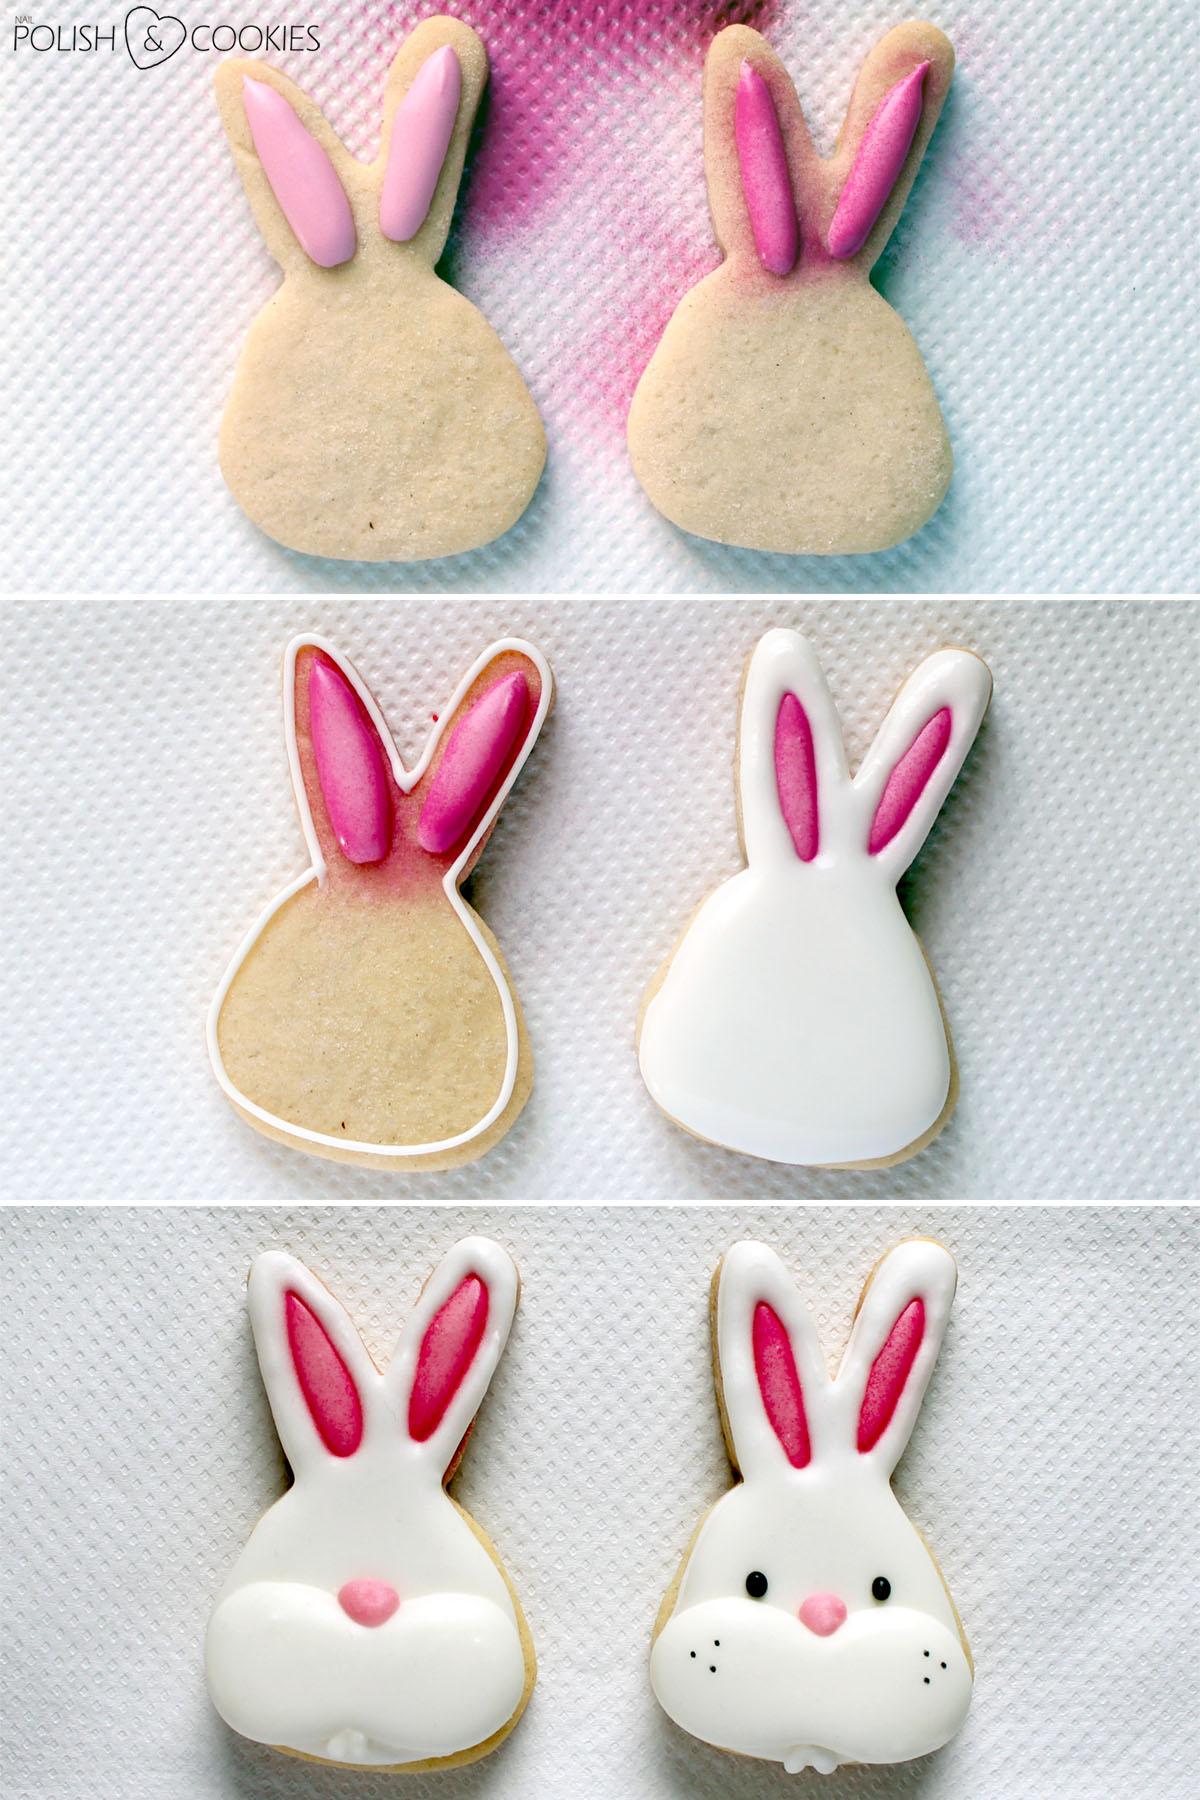 ciasteczka zajaczki